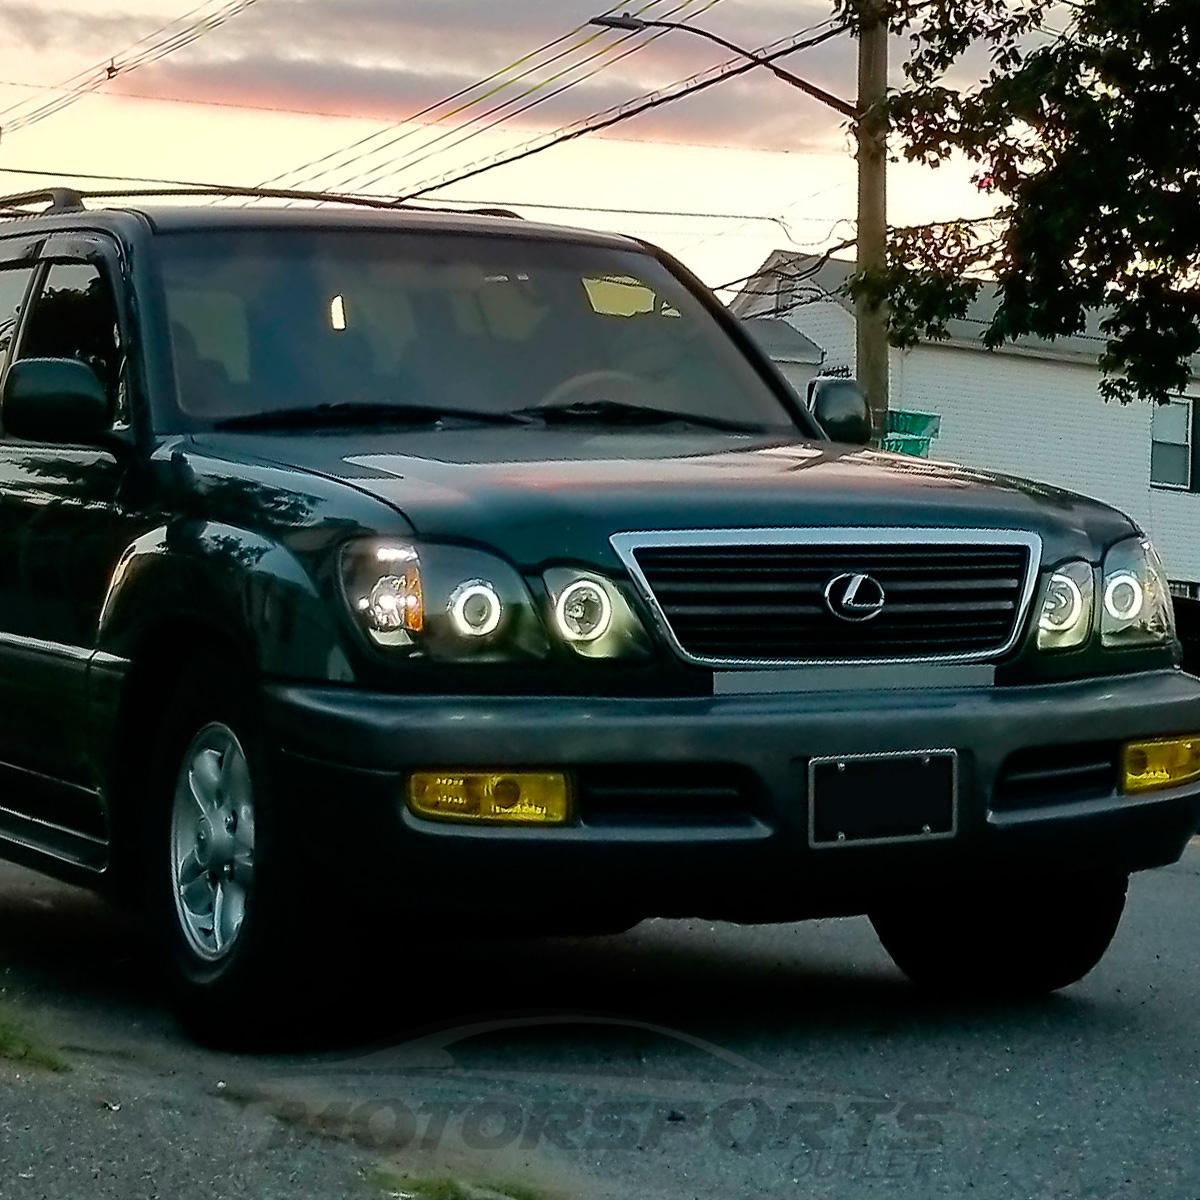 1998 1999 2000 2001 2002 2003 2004 2005 2006 2007 Lexus LX470